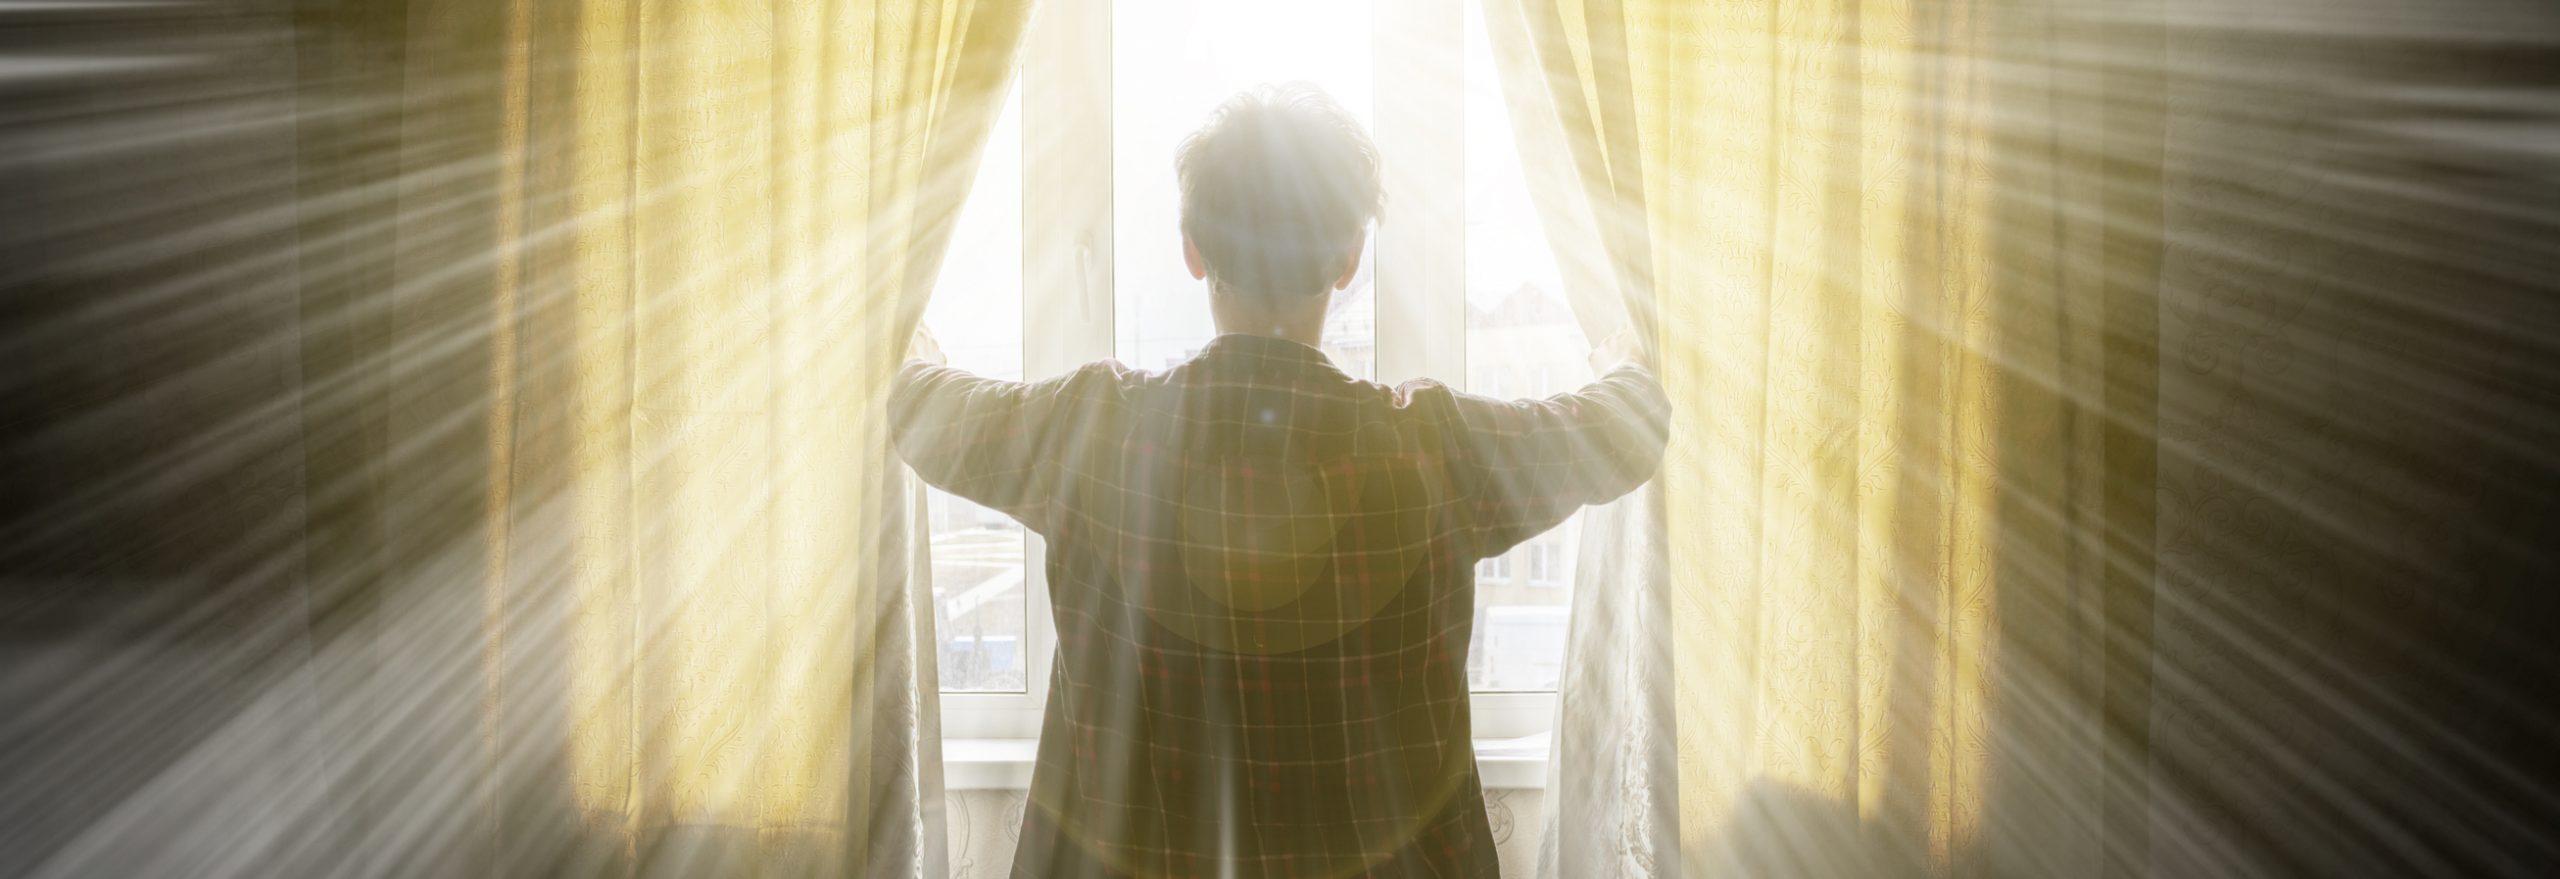 A Nasal-Spray Treatment for Depression? How Esketamine Works